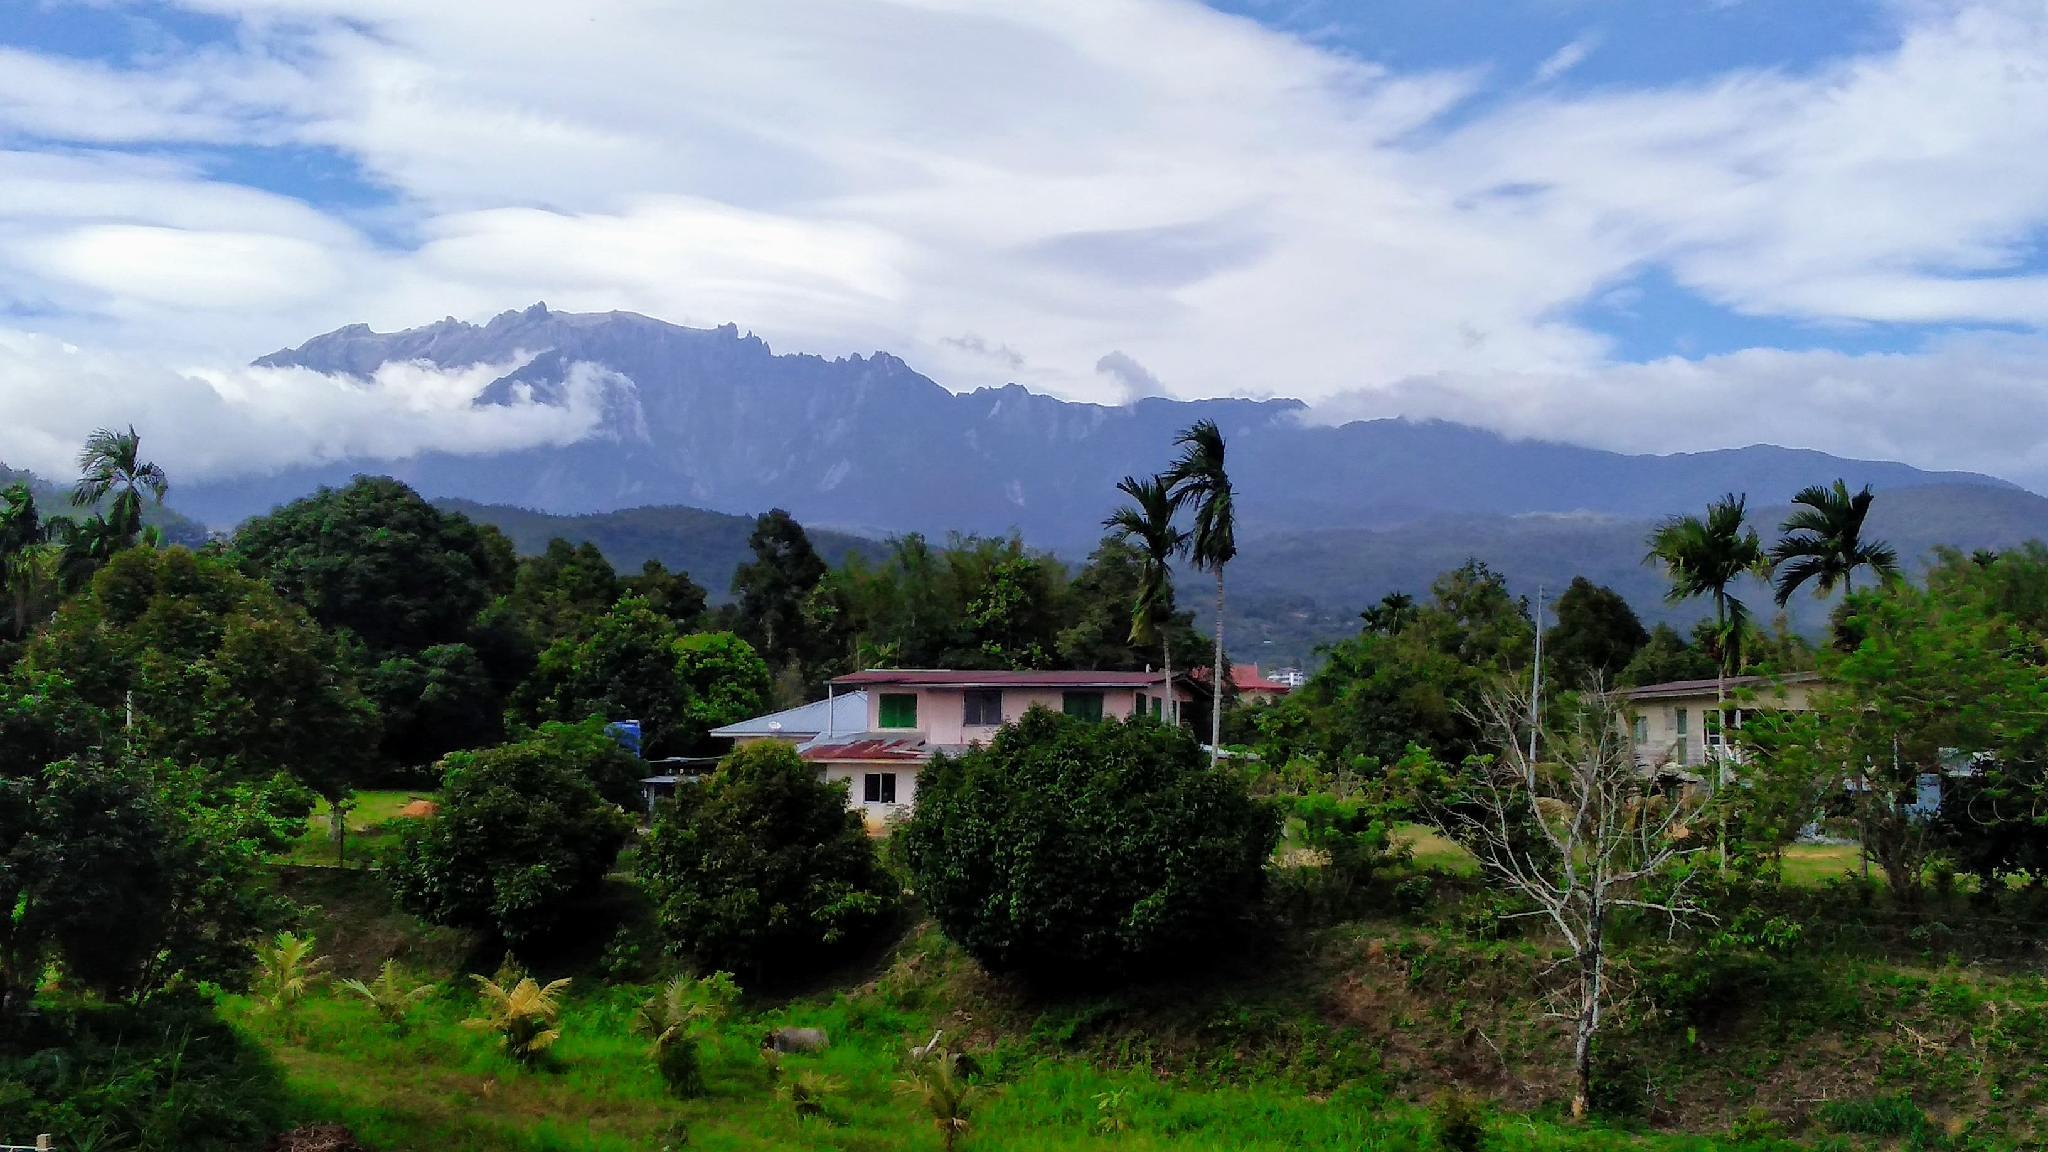 LUMAVA MOUNTAIN VIEW HOMESTAY